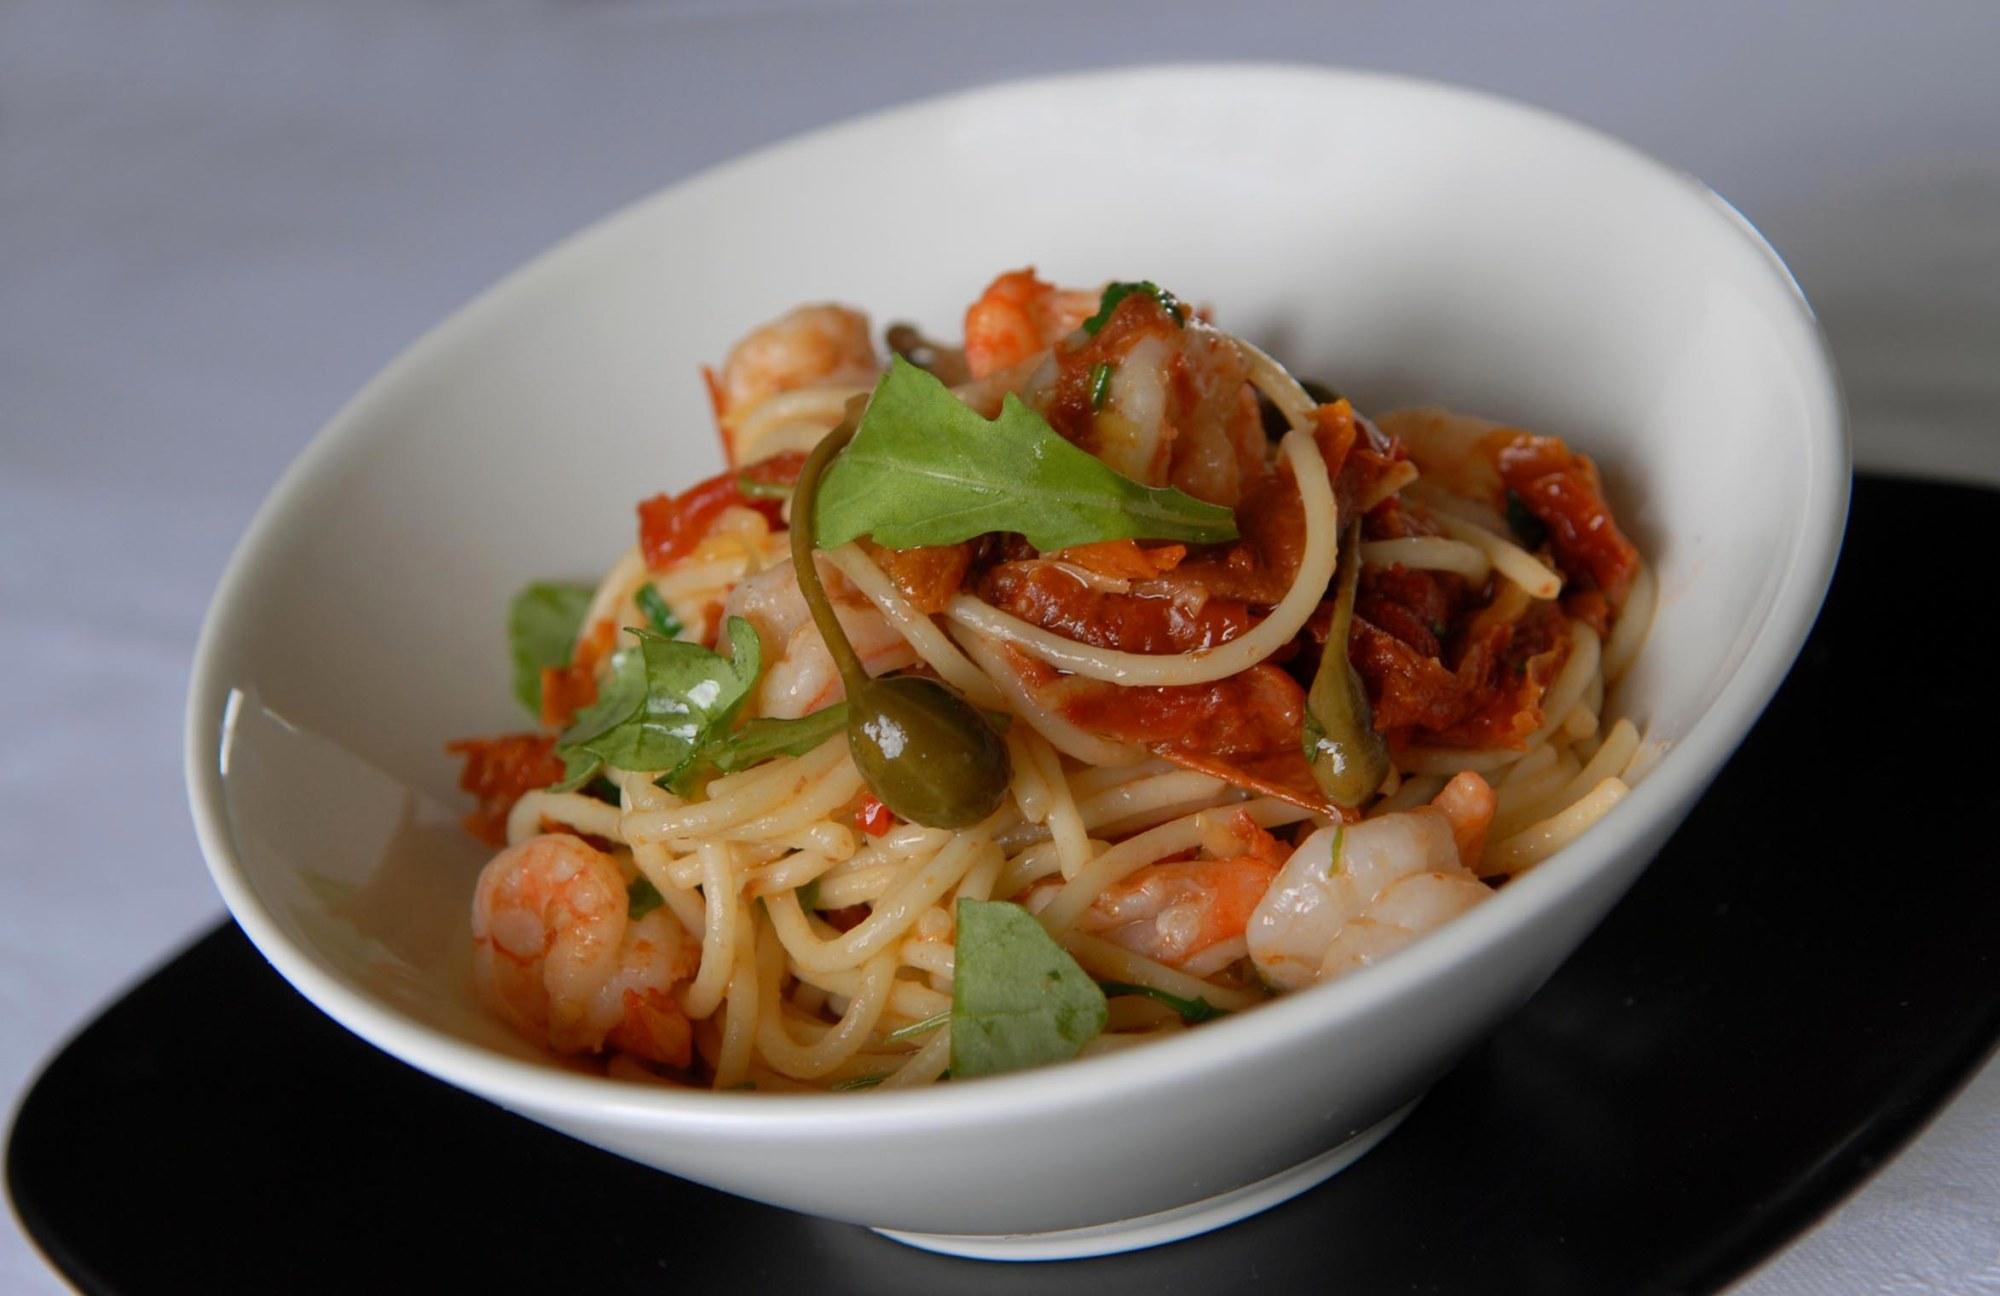 SB220507Ashton-05PICTURE BY SAM BAGNALL.Prawn, Tomato and Capers with Spaghetti.Kevin Ashton recipe for Sunday Mercury....SB220507Ashton-05